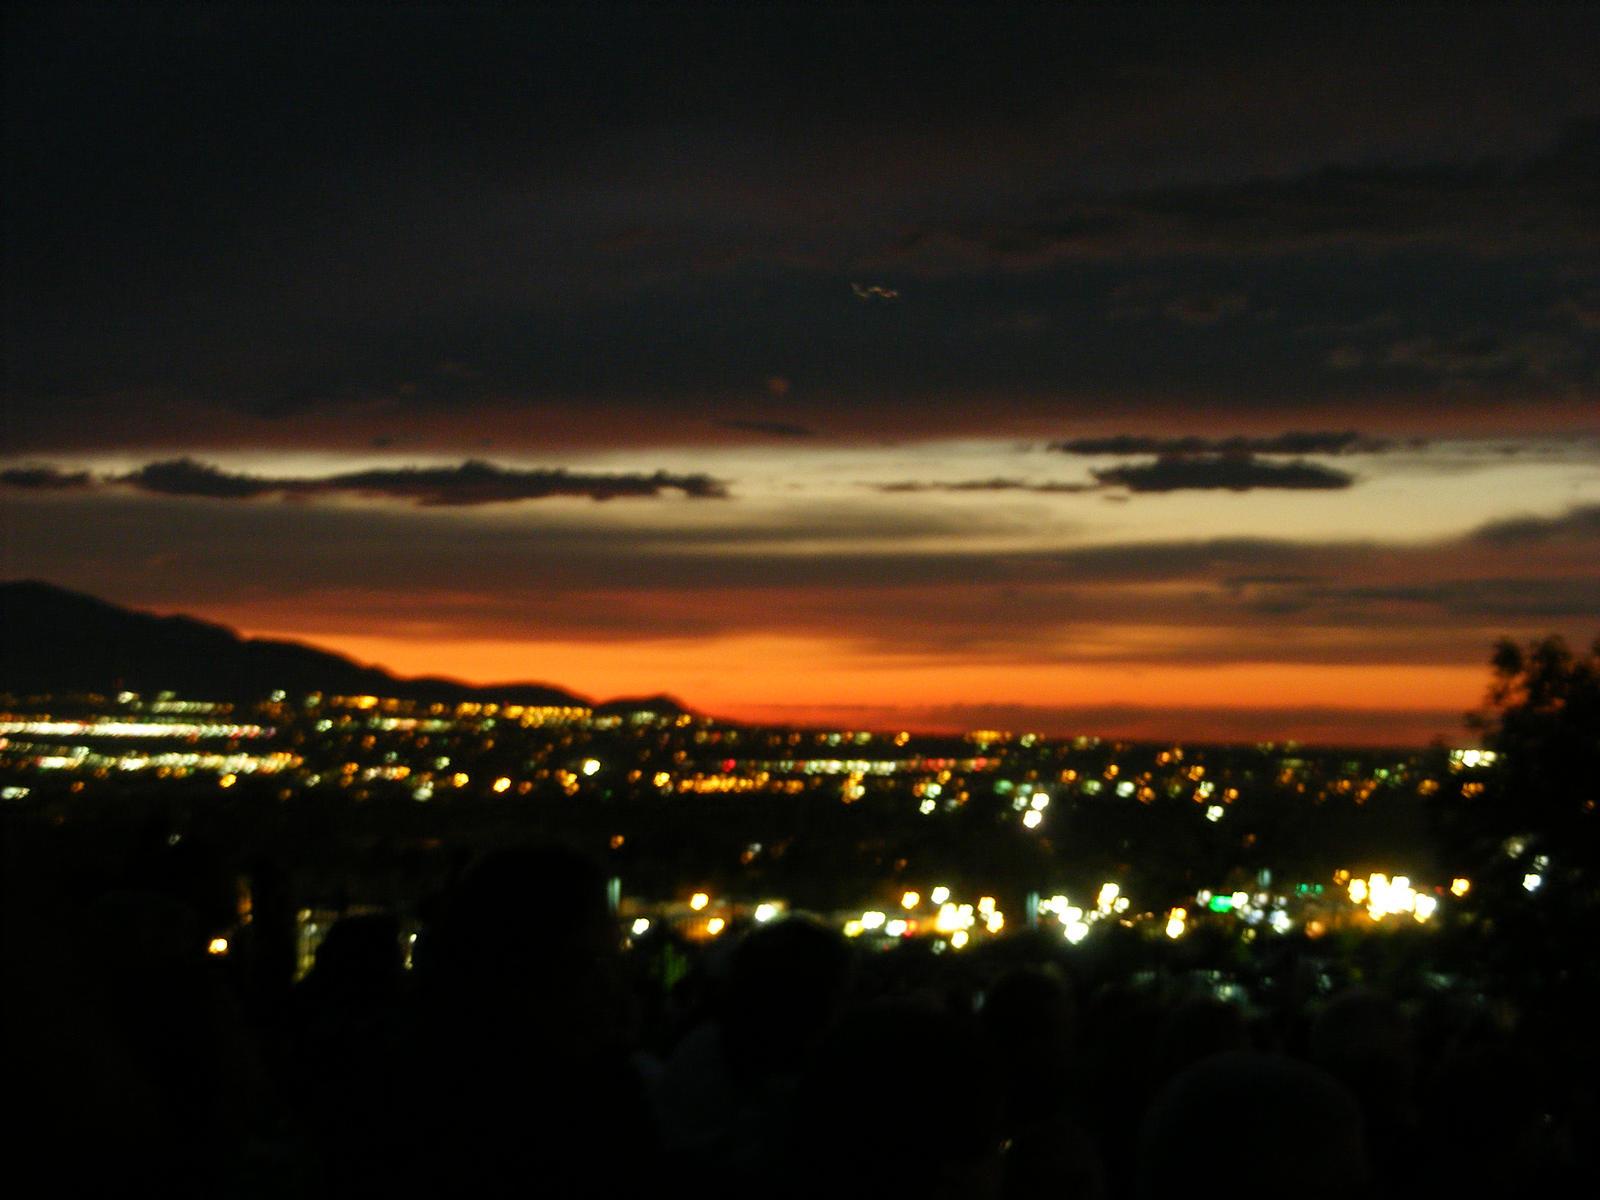 Salt Lake City At Sunset By Mslaura488 On Deviantart